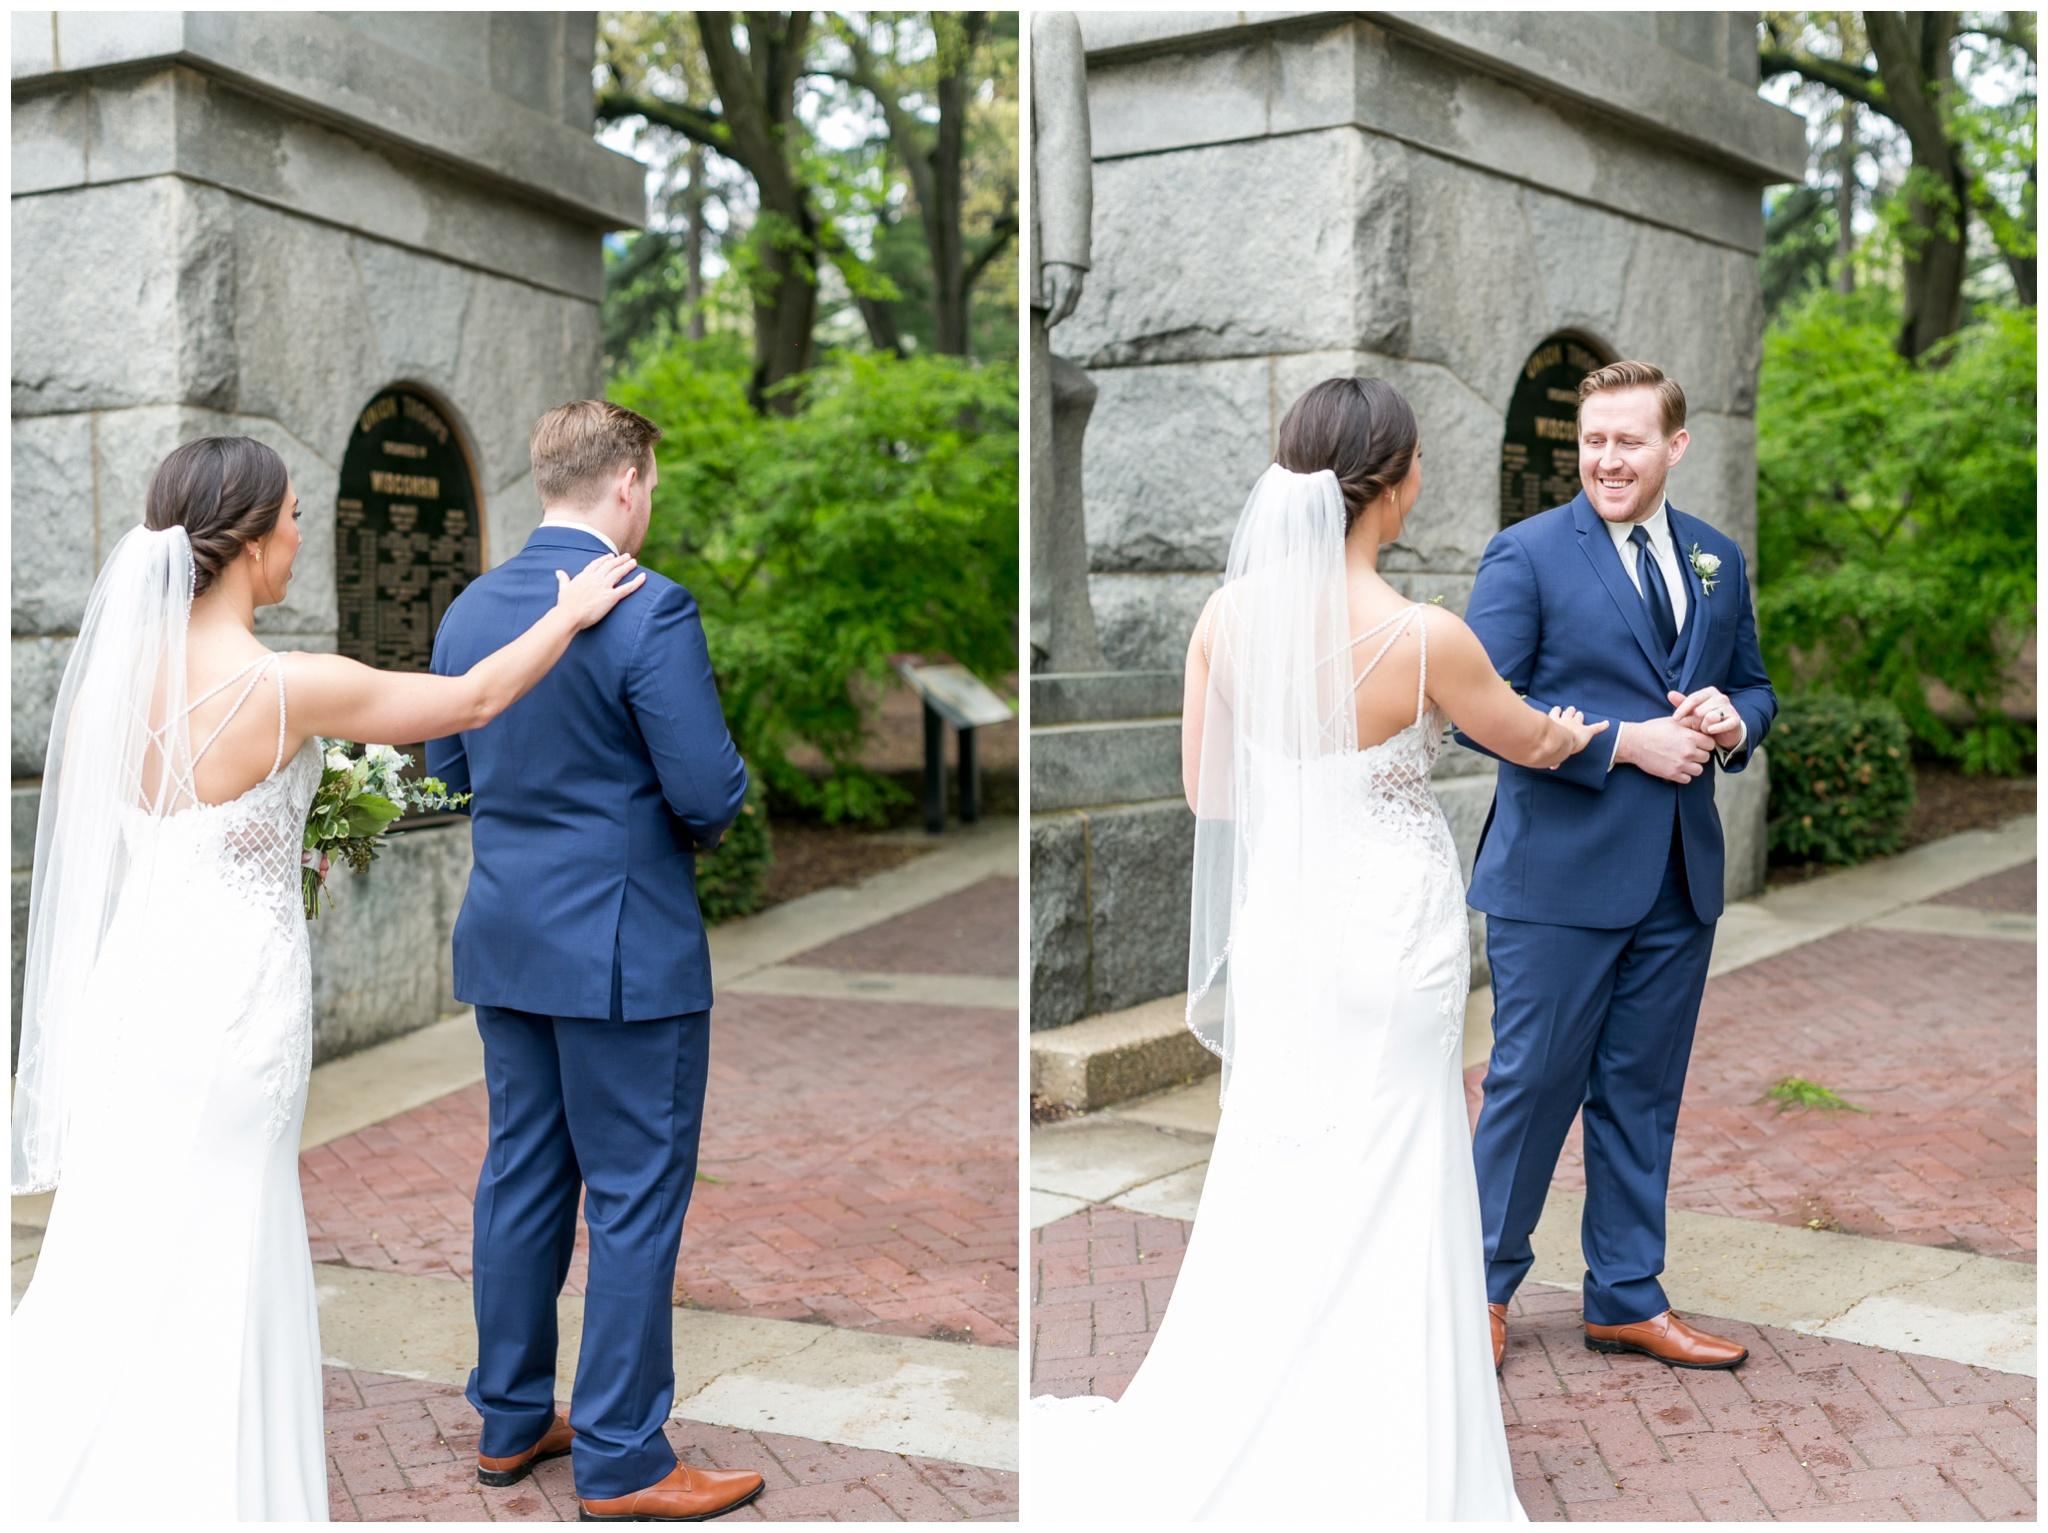 Union_south_Wedding_Madison_Wisconsin_Caynay_Photo_3629.jpg